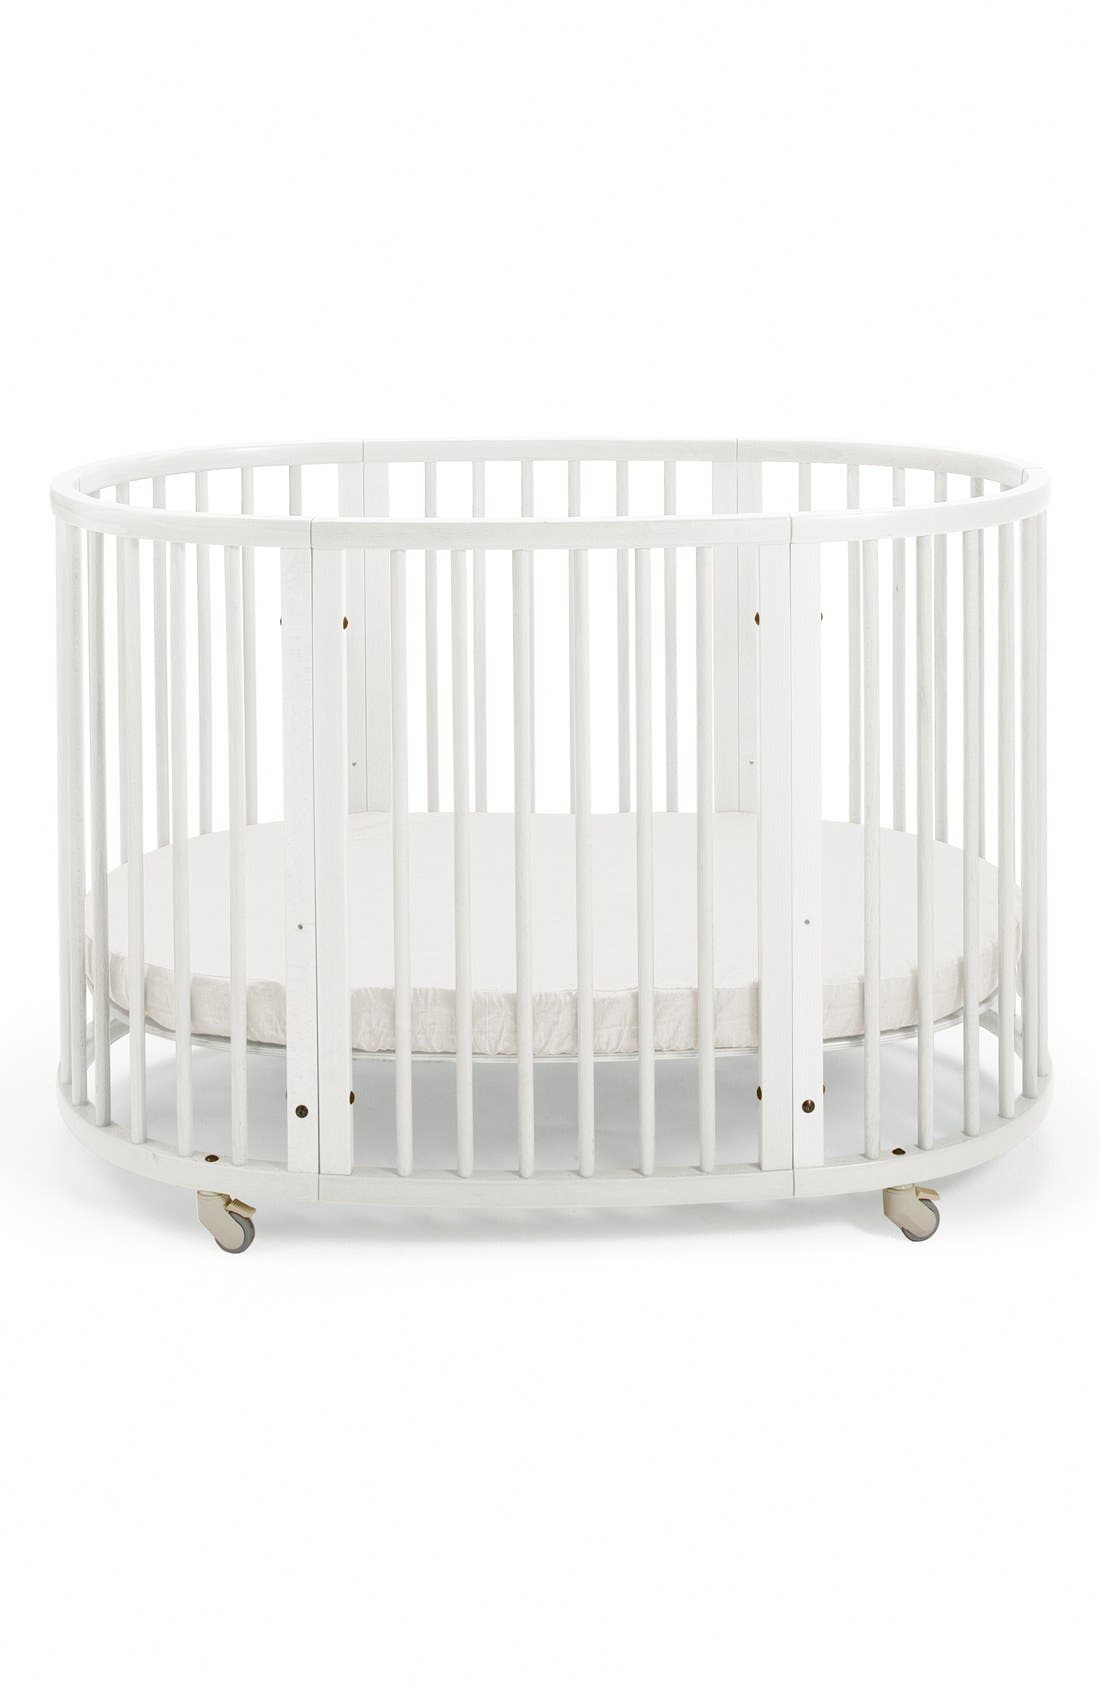 Alternate Image 1 Selected - Stokke Convertible Sleepi Crib & Toddler Bed